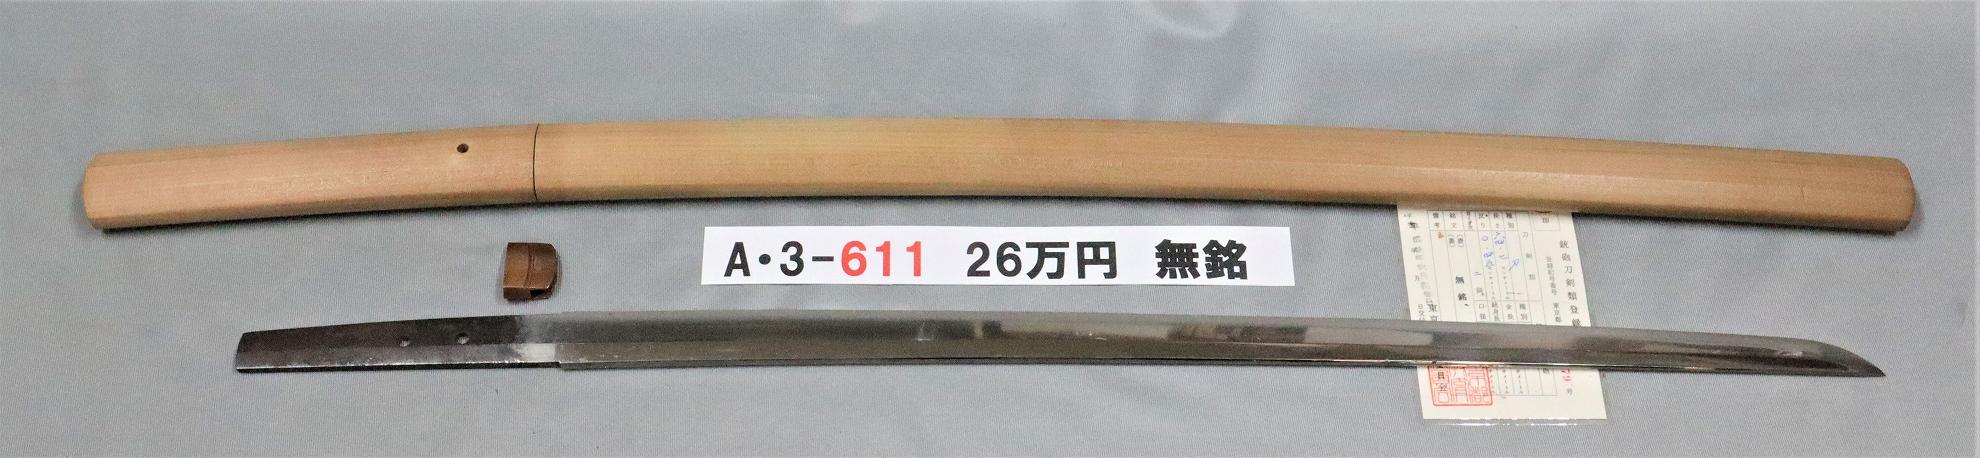 A3611